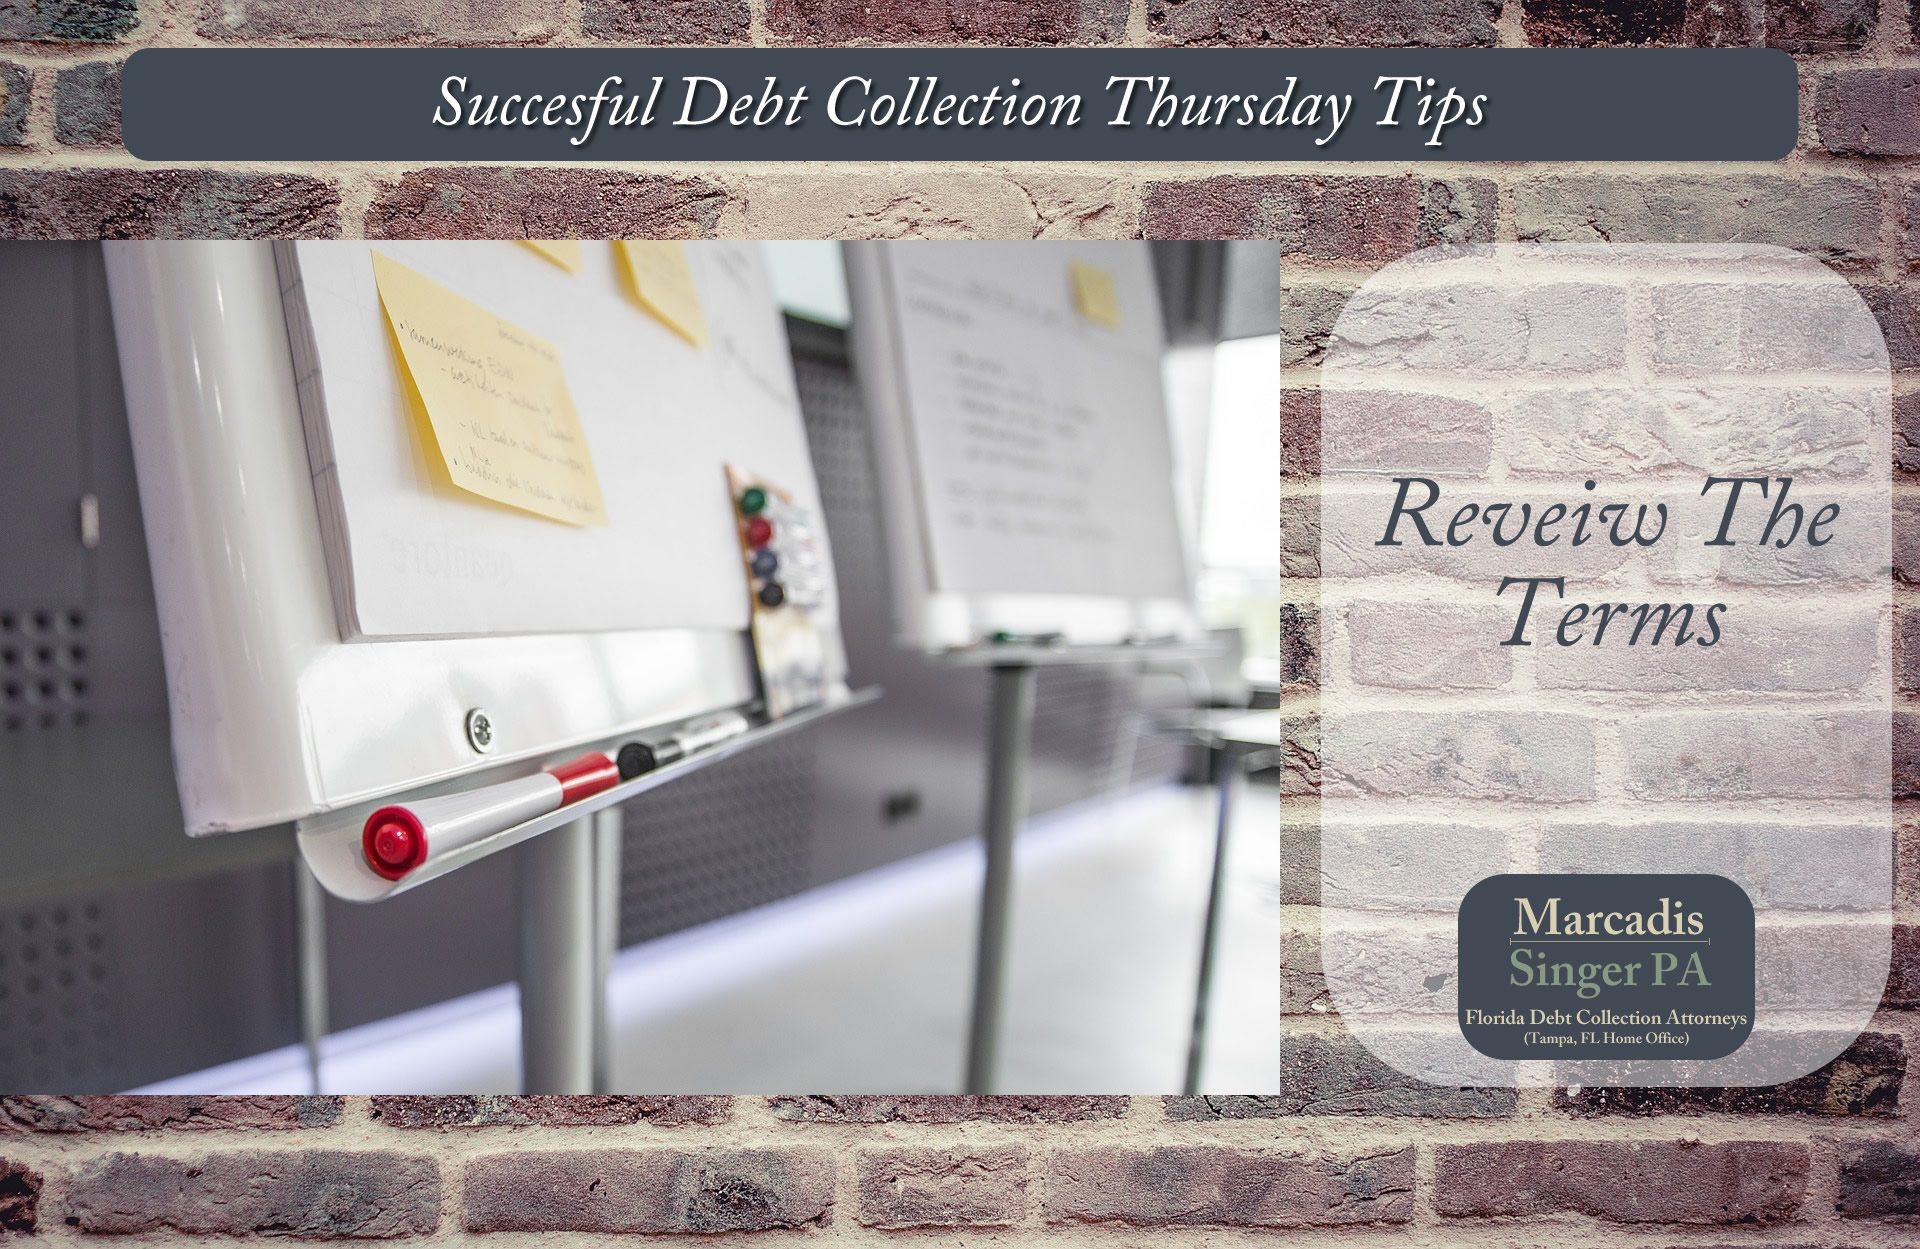 Thursday Debt Collection Tips  (#8 In A Series)